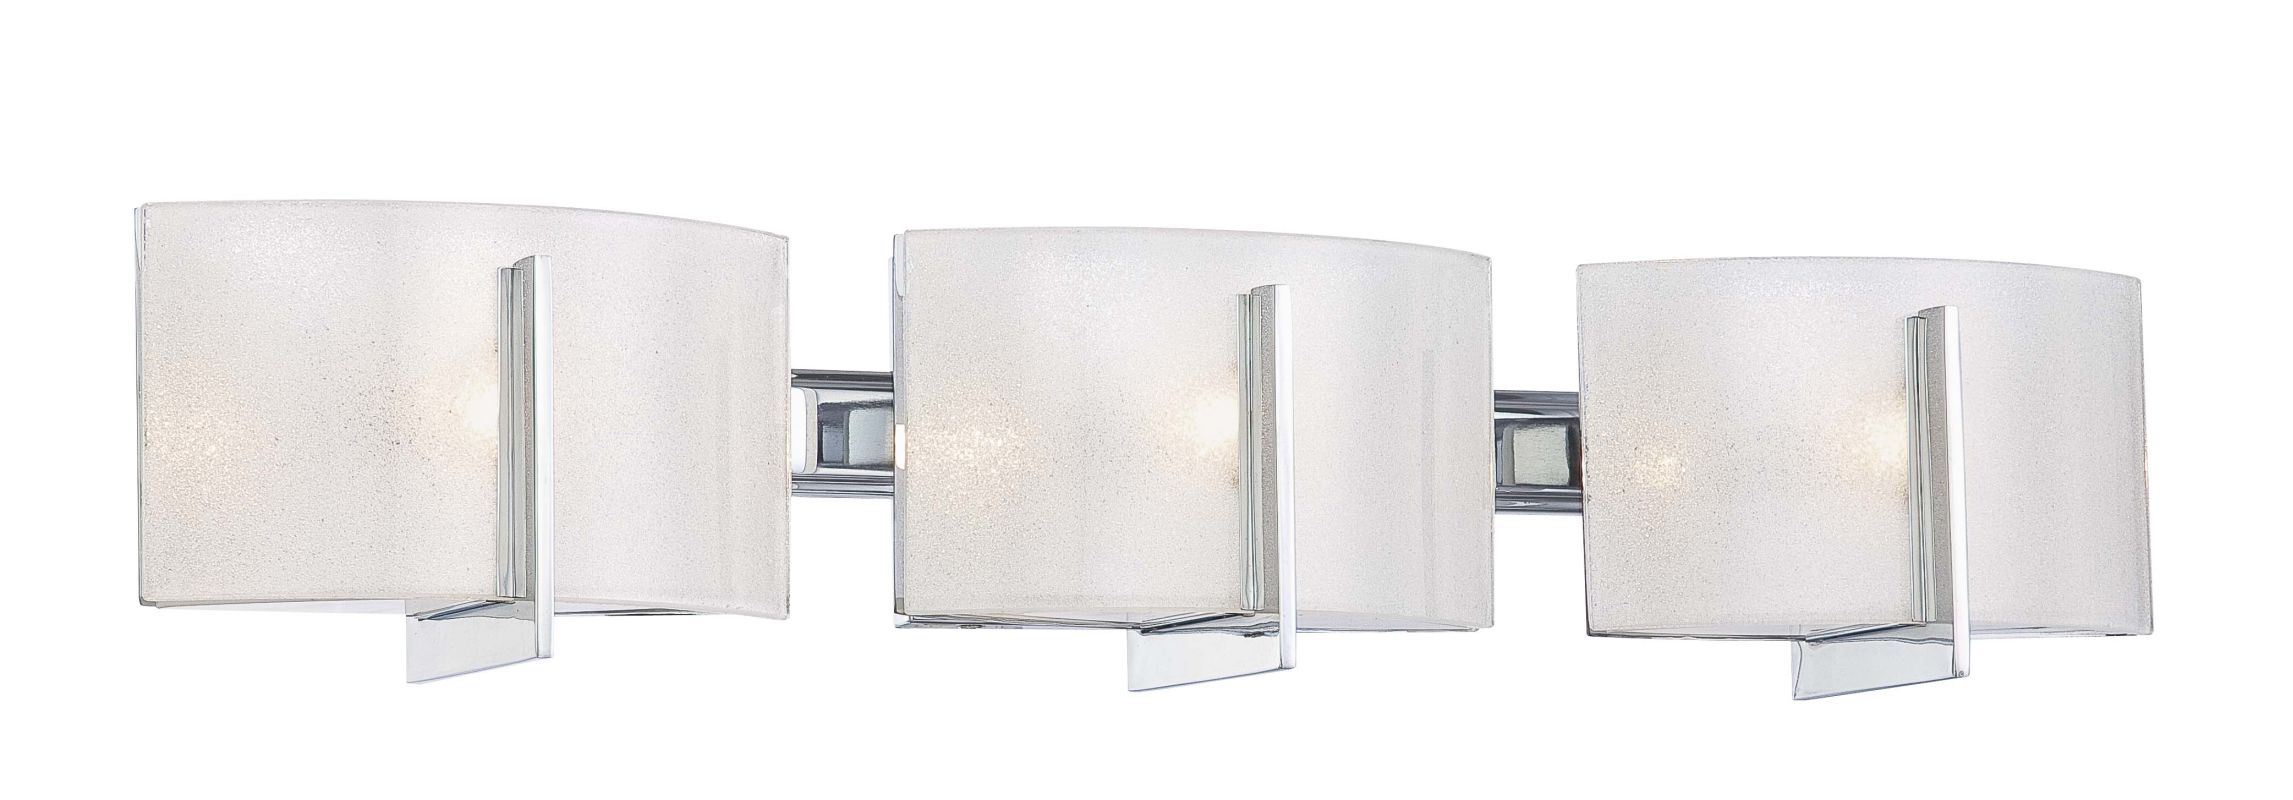 Minka Lavery 6393-77 Chrome Contemporary Clart� Bathroom Light Sale $197.00 ITEM: bci1723127 ID#:6393-77 UPC: 747396077352 :